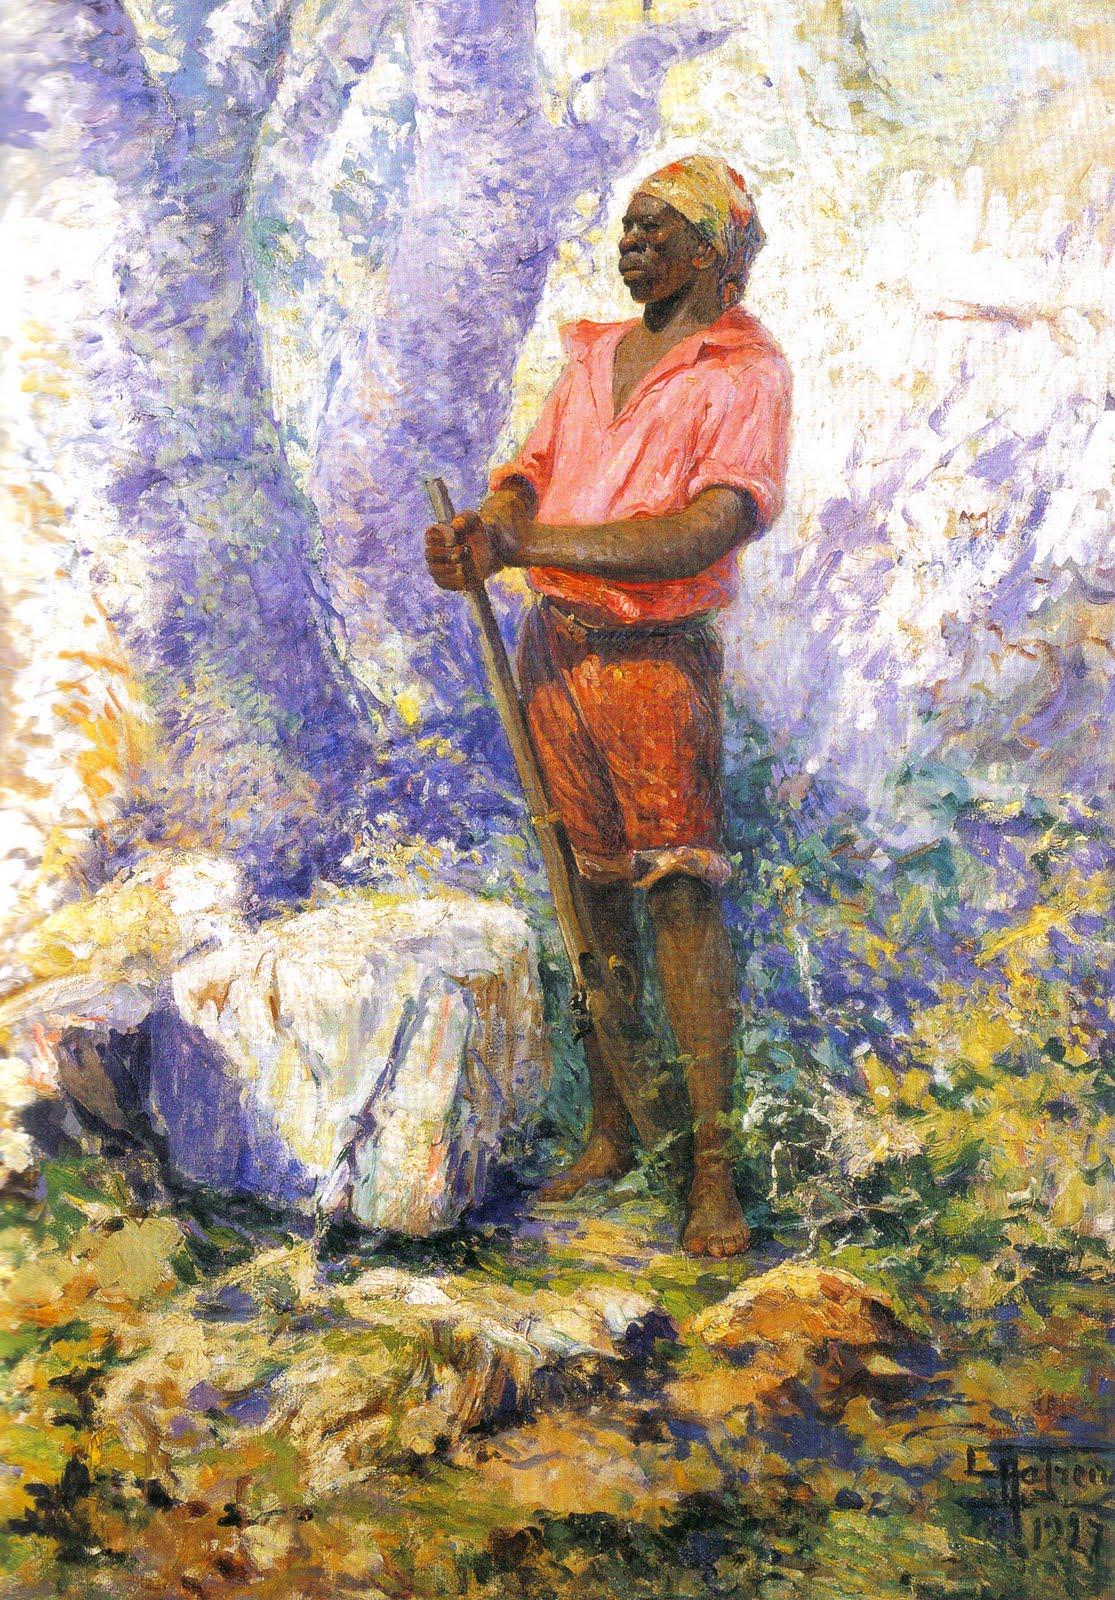 Pinturas de Zumbi dos Palmares ~ Líder da resistência negra